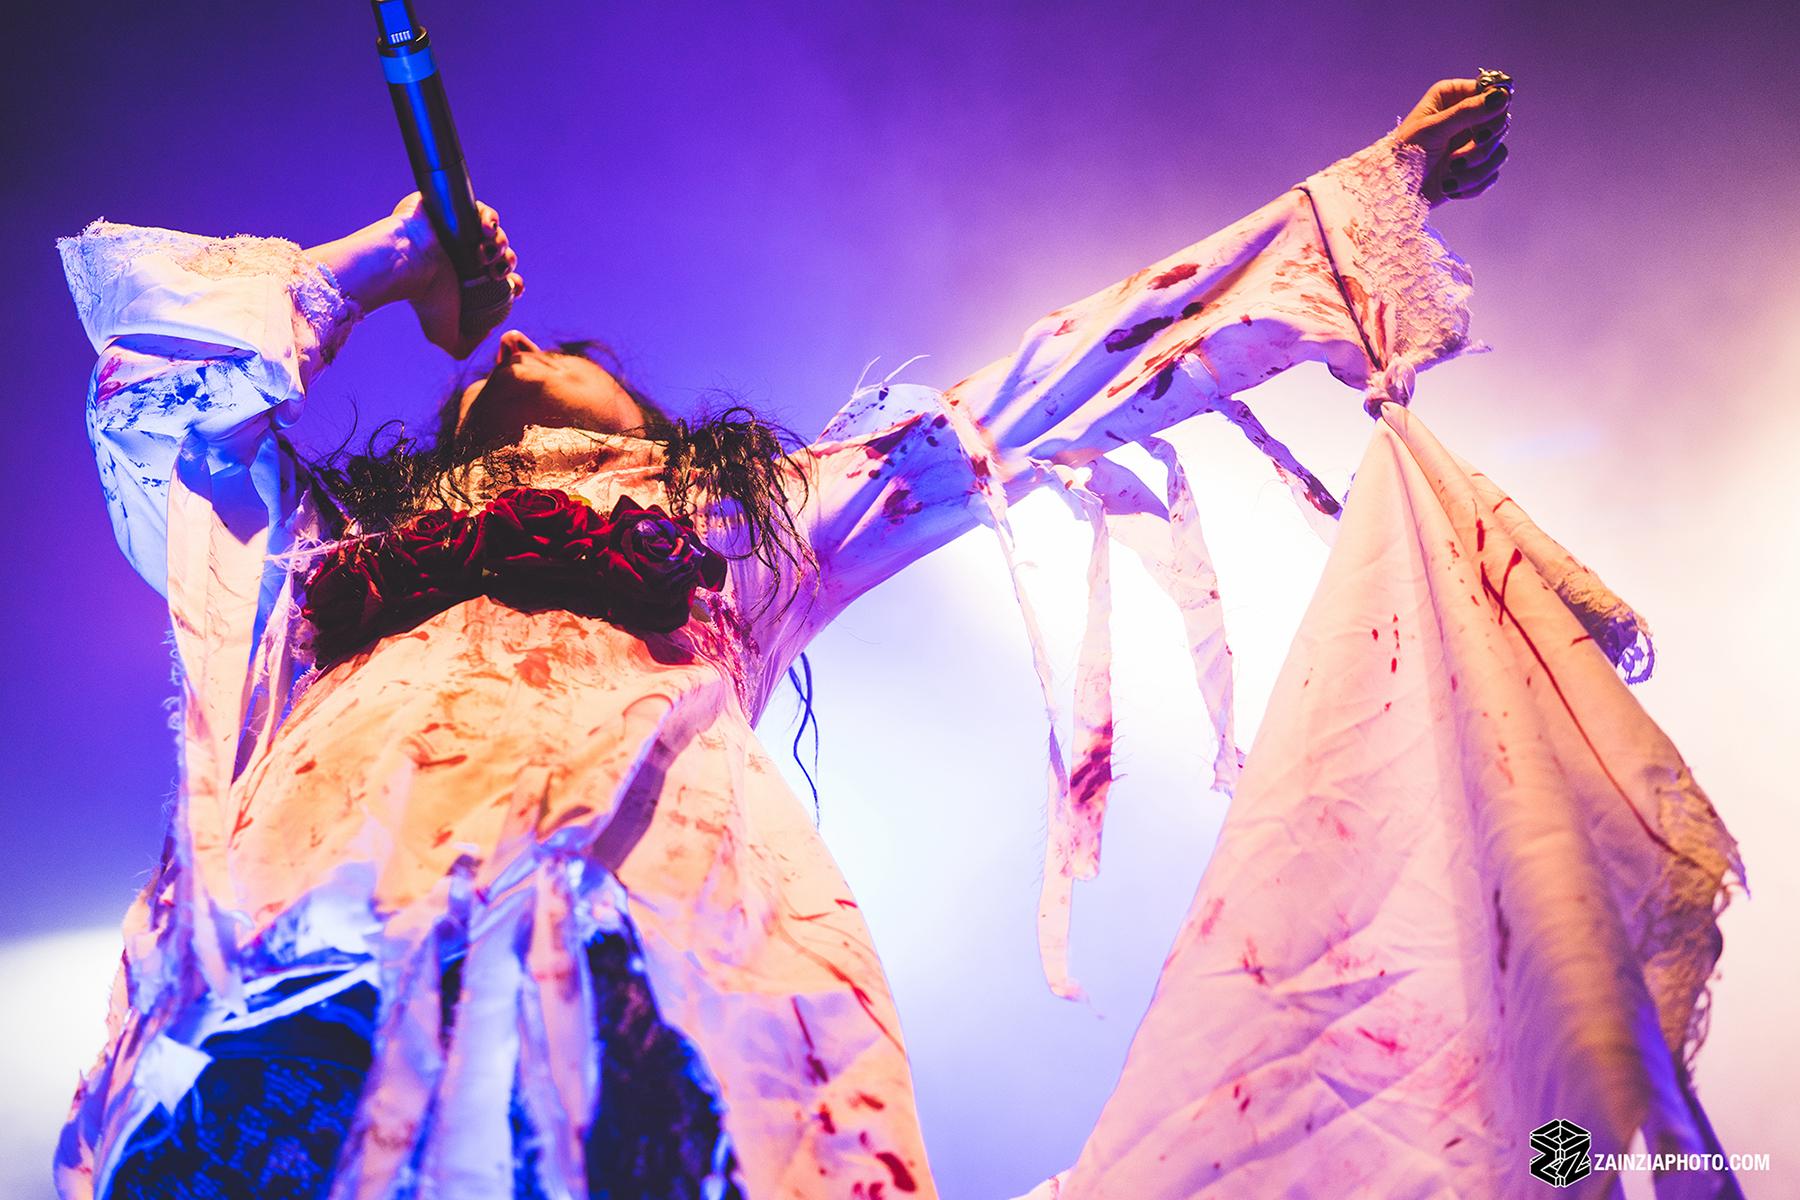 LACUNA COIL - THE RITZ, MANCHESTER 2014